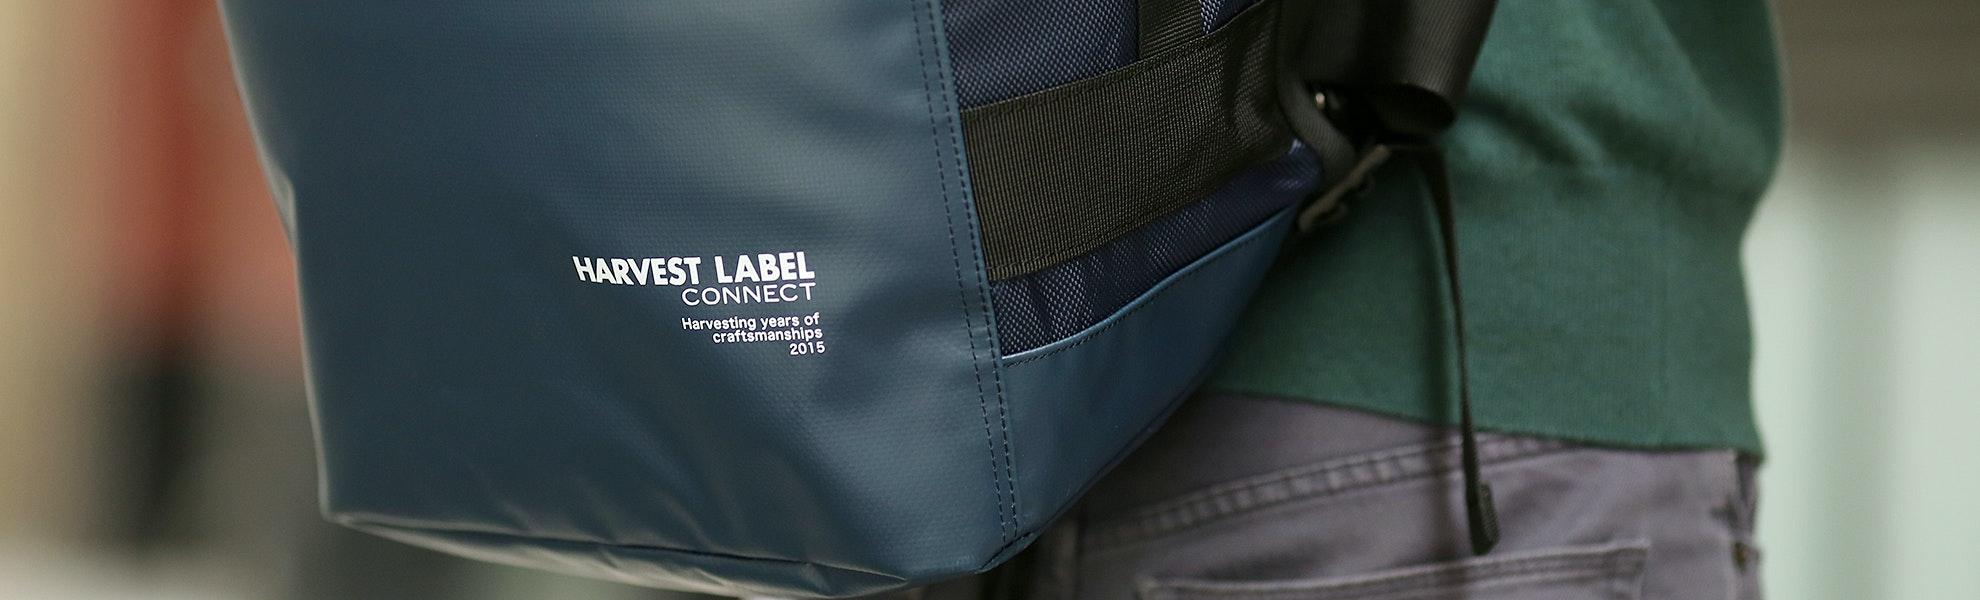 Harvest Label 3-Way Duffel Pack